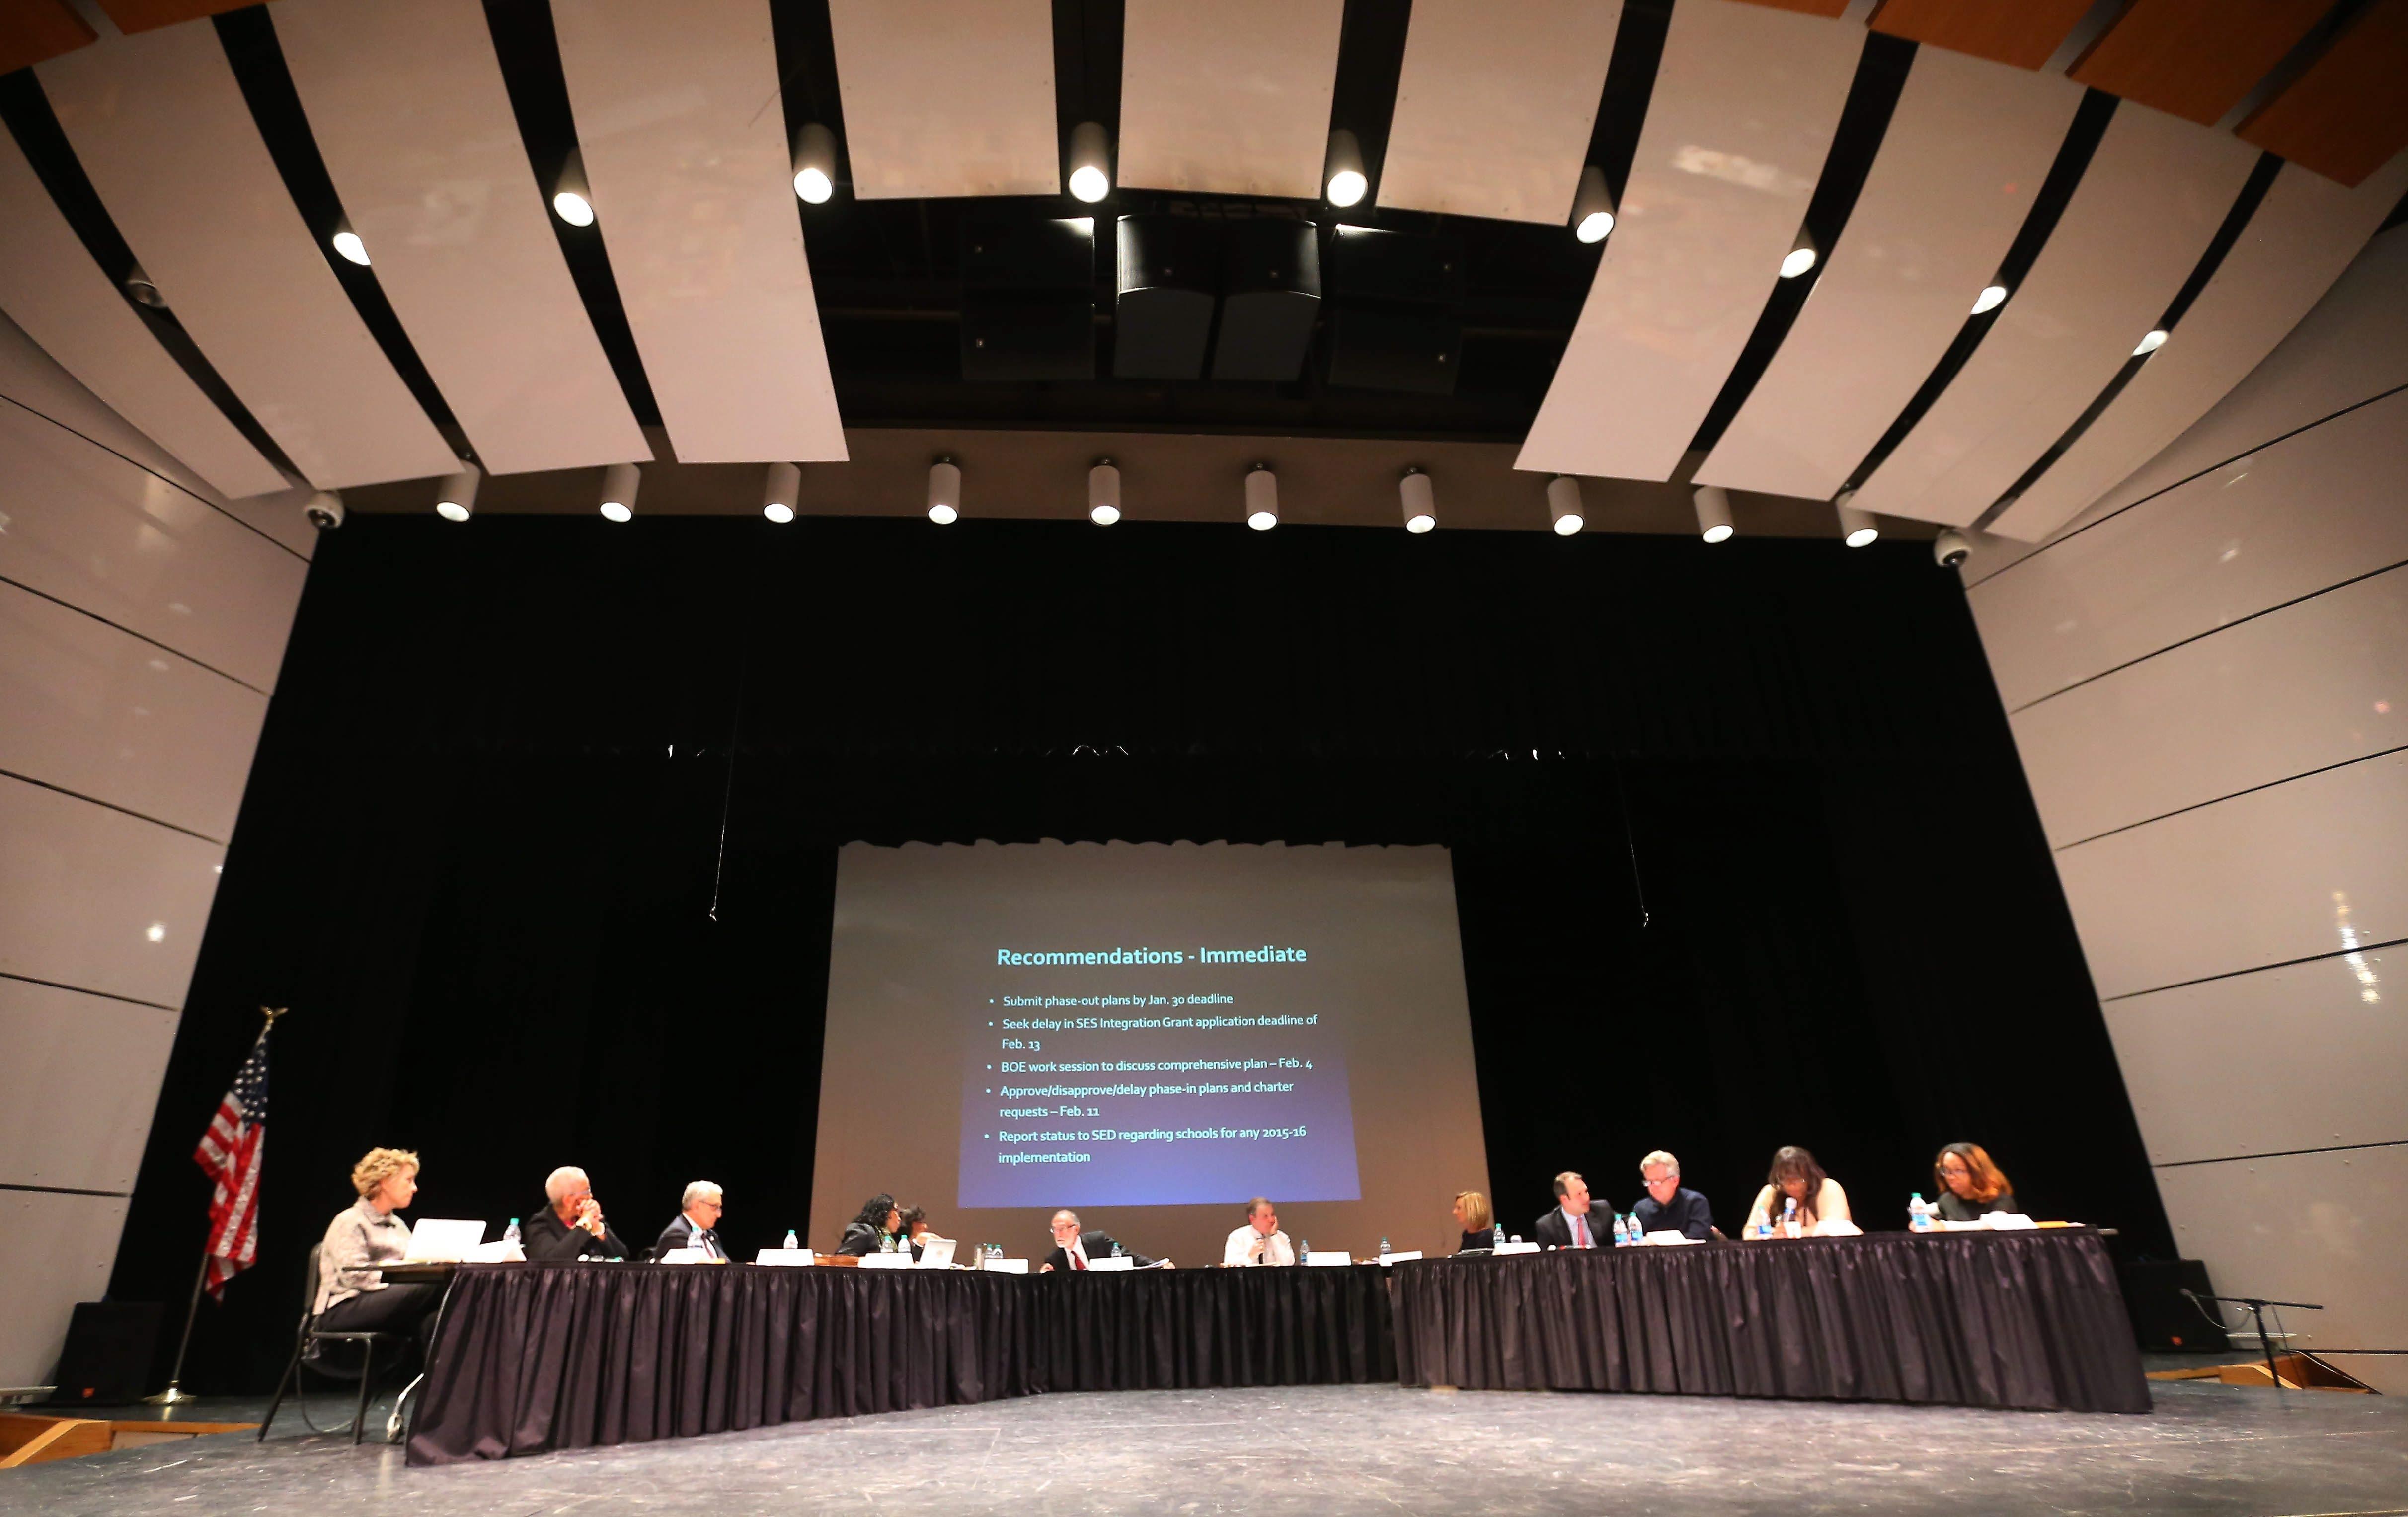 Buffalo school board members meet at Buffalo Academy for Visual and Performing Arts in Buffalo Thursday, January 28, 2015.  (Mark Mulville/Buffalo News)